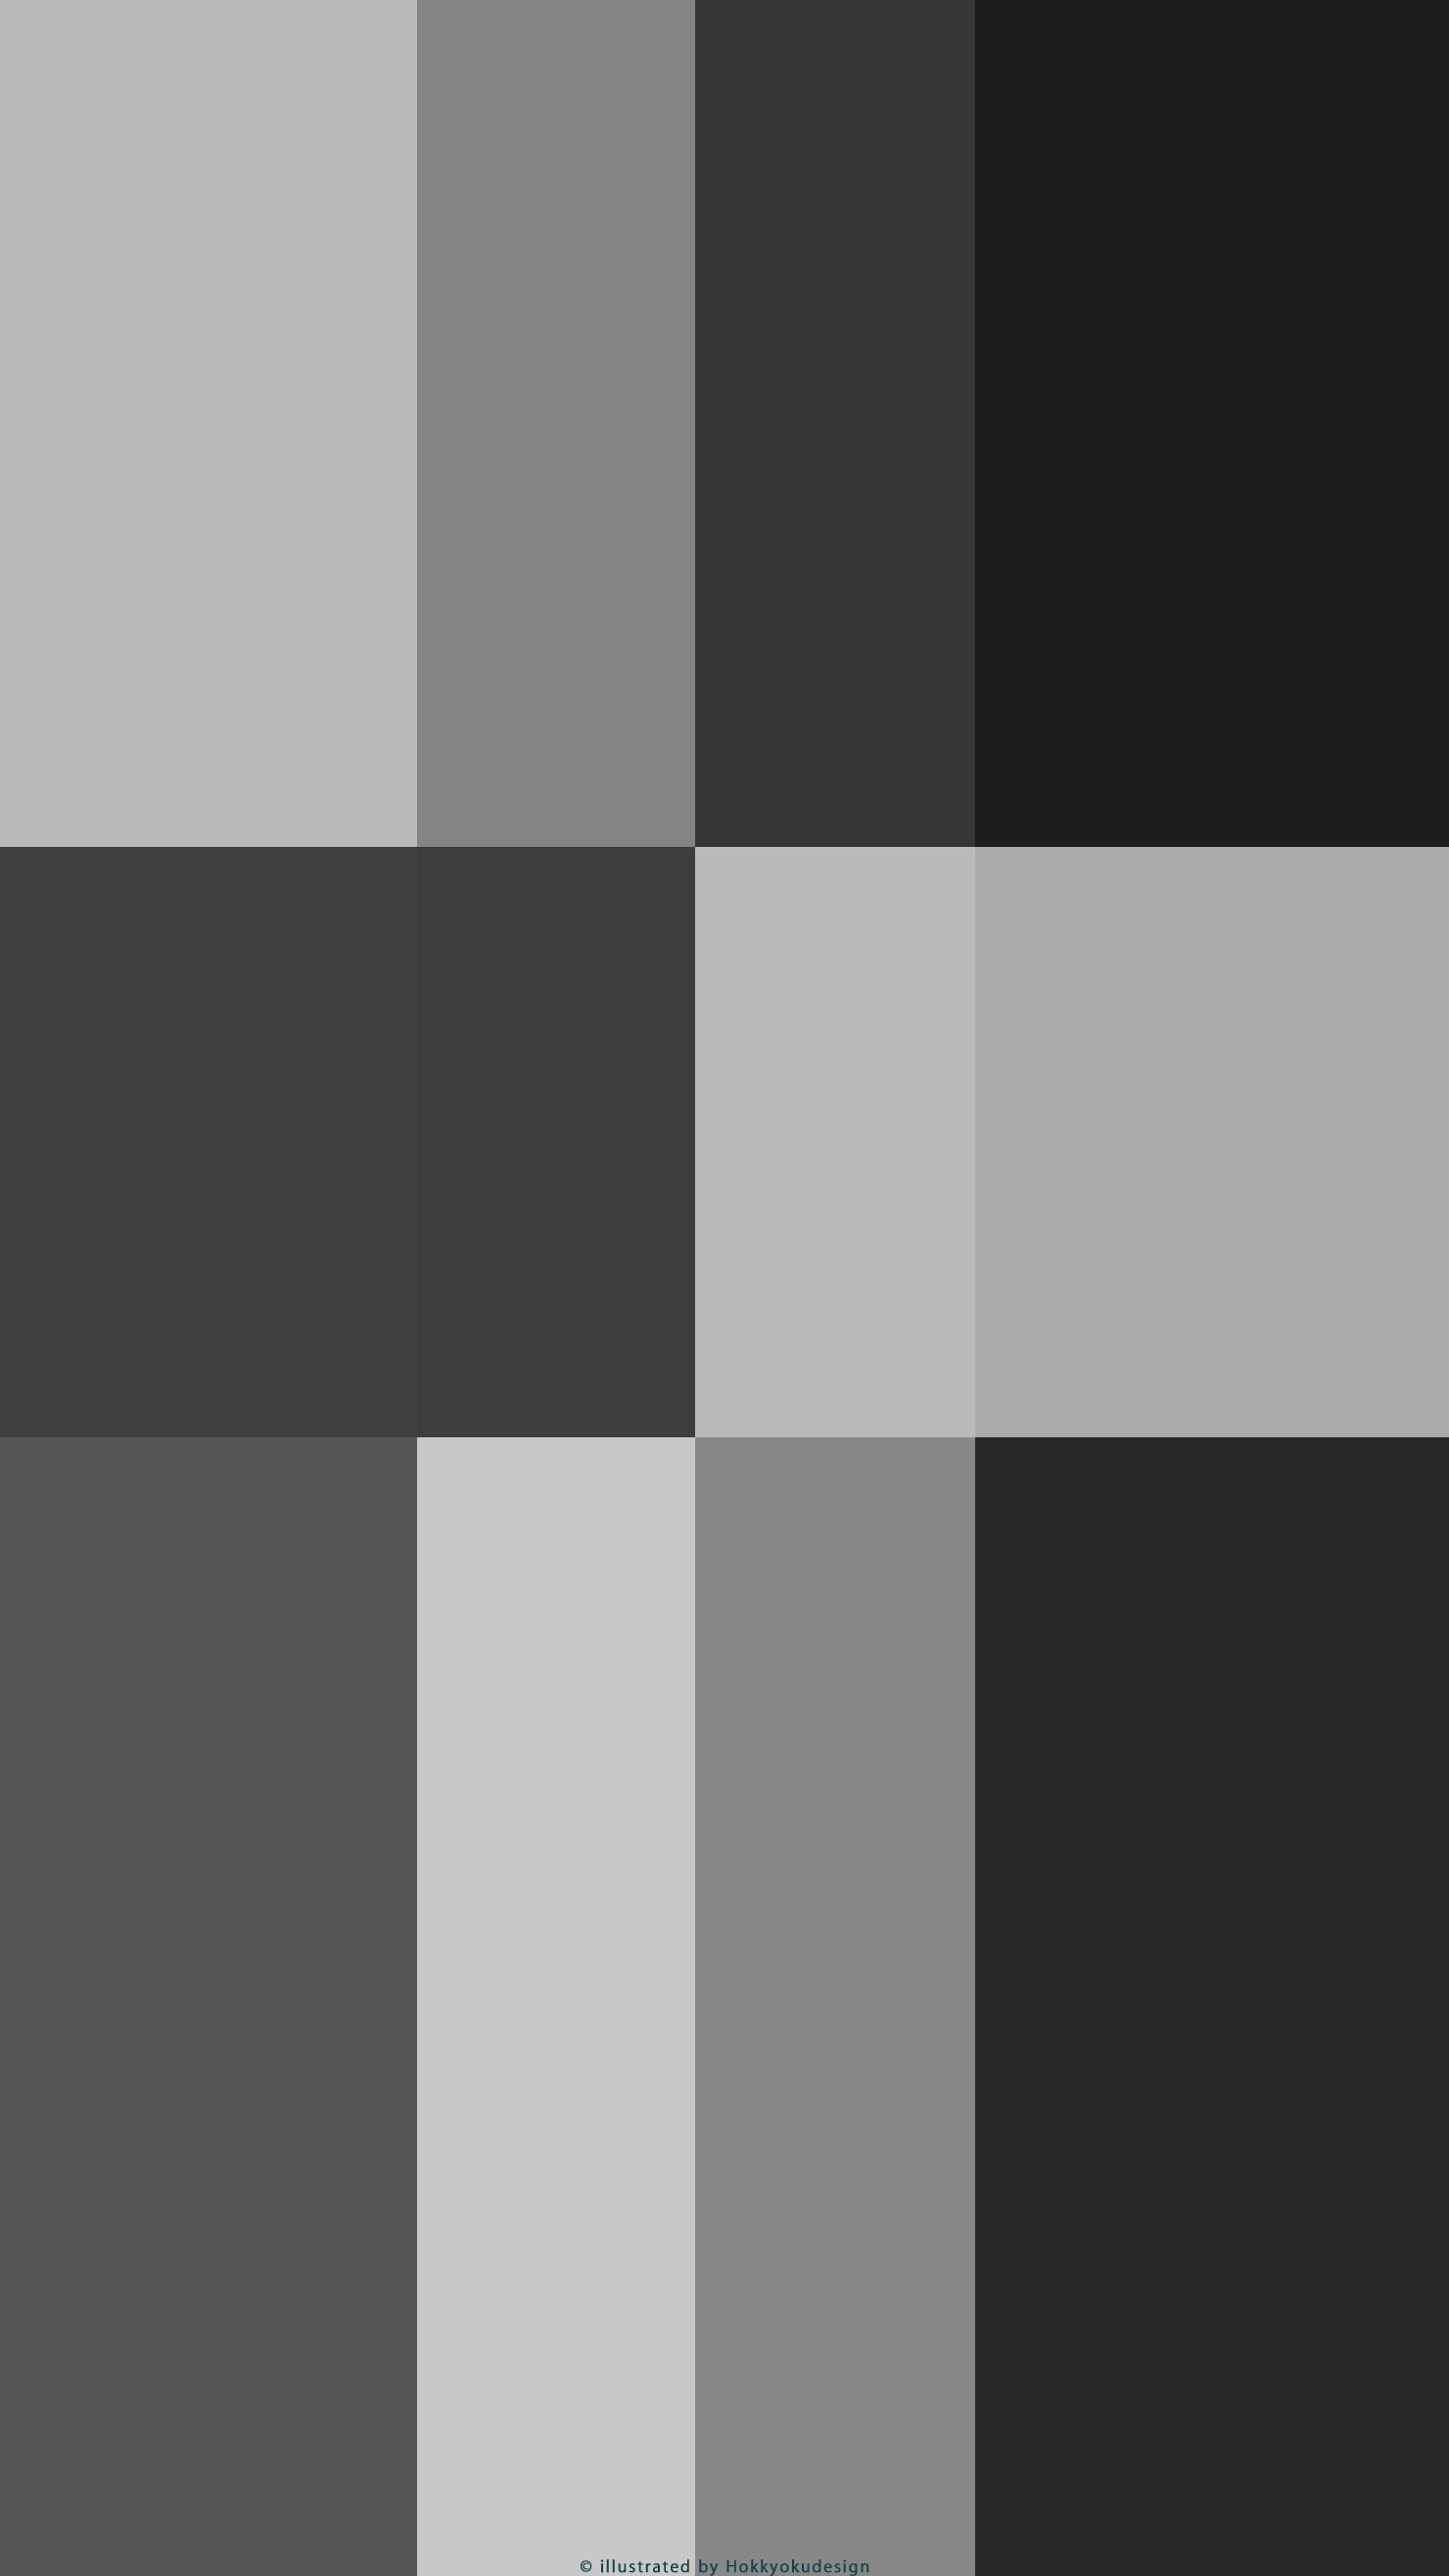 Iphone6plus専用 ぴったり合う縦方向の棚の壁紙 濃いモノトーン Wallpaper To Iphone6 Portrait Shelf Moving Wallpaper